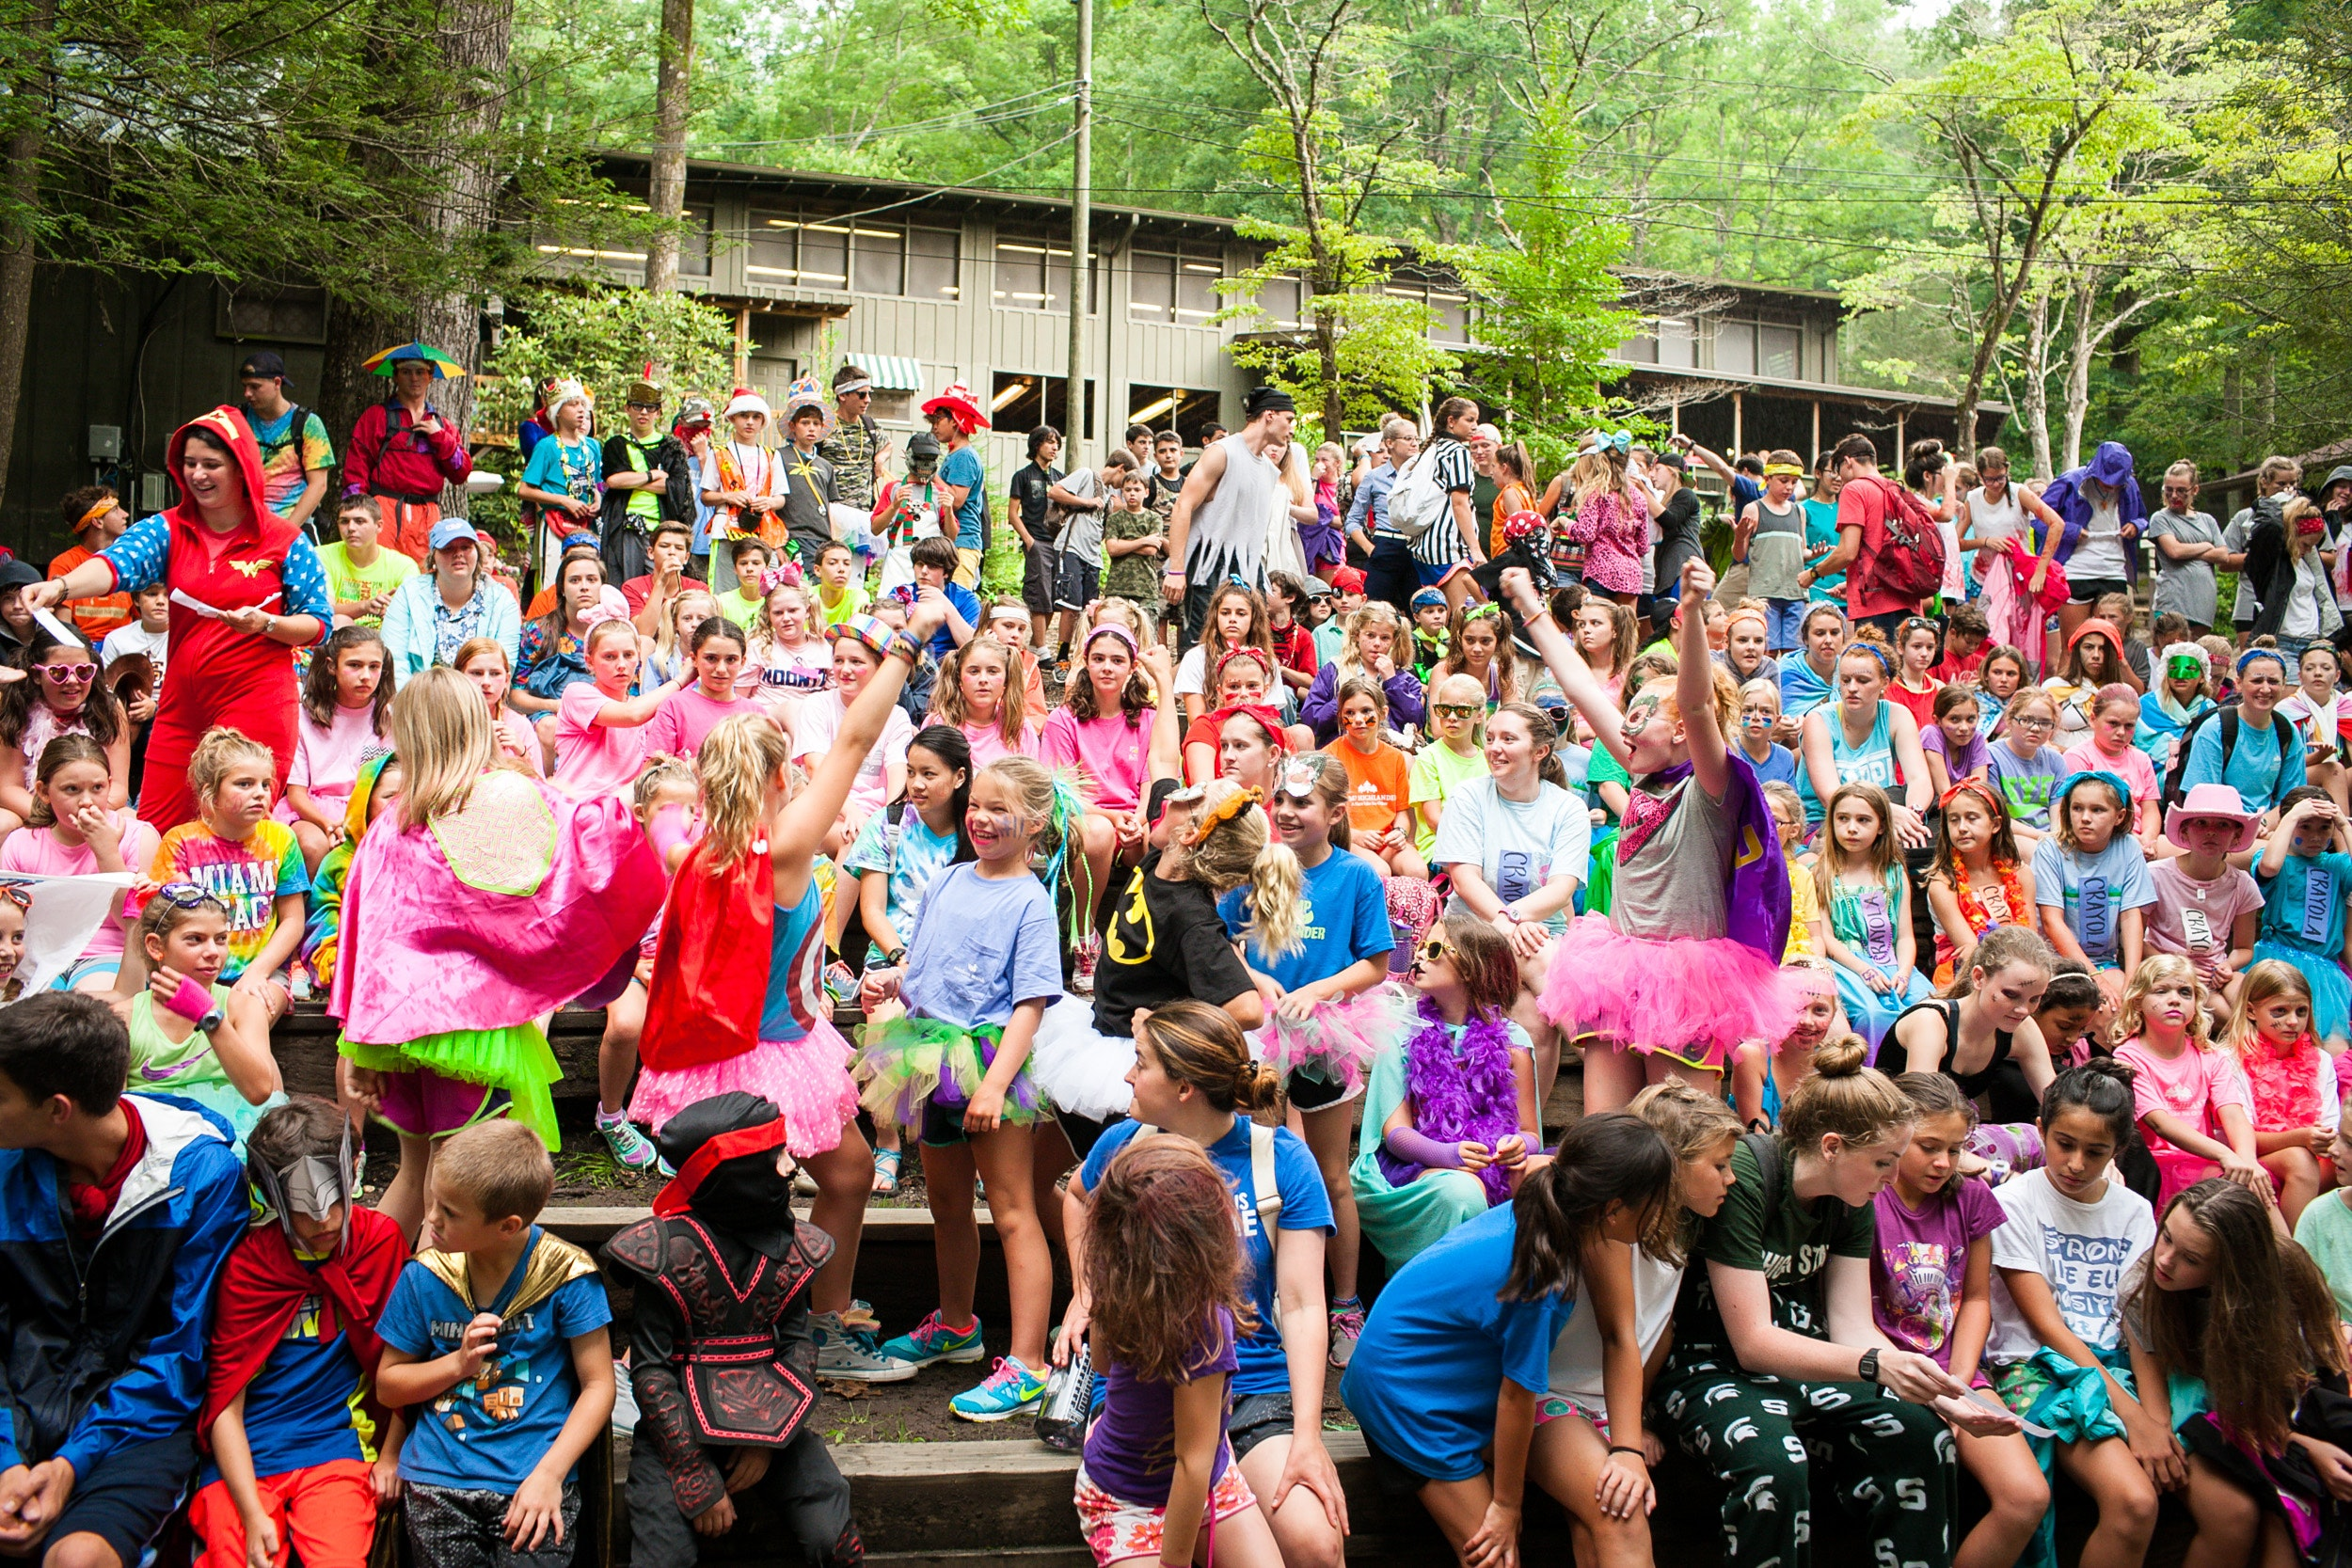 Evening costume programs in at camp highlander coed summer camp in north carolina.jpg?ixlib=rails 2.1